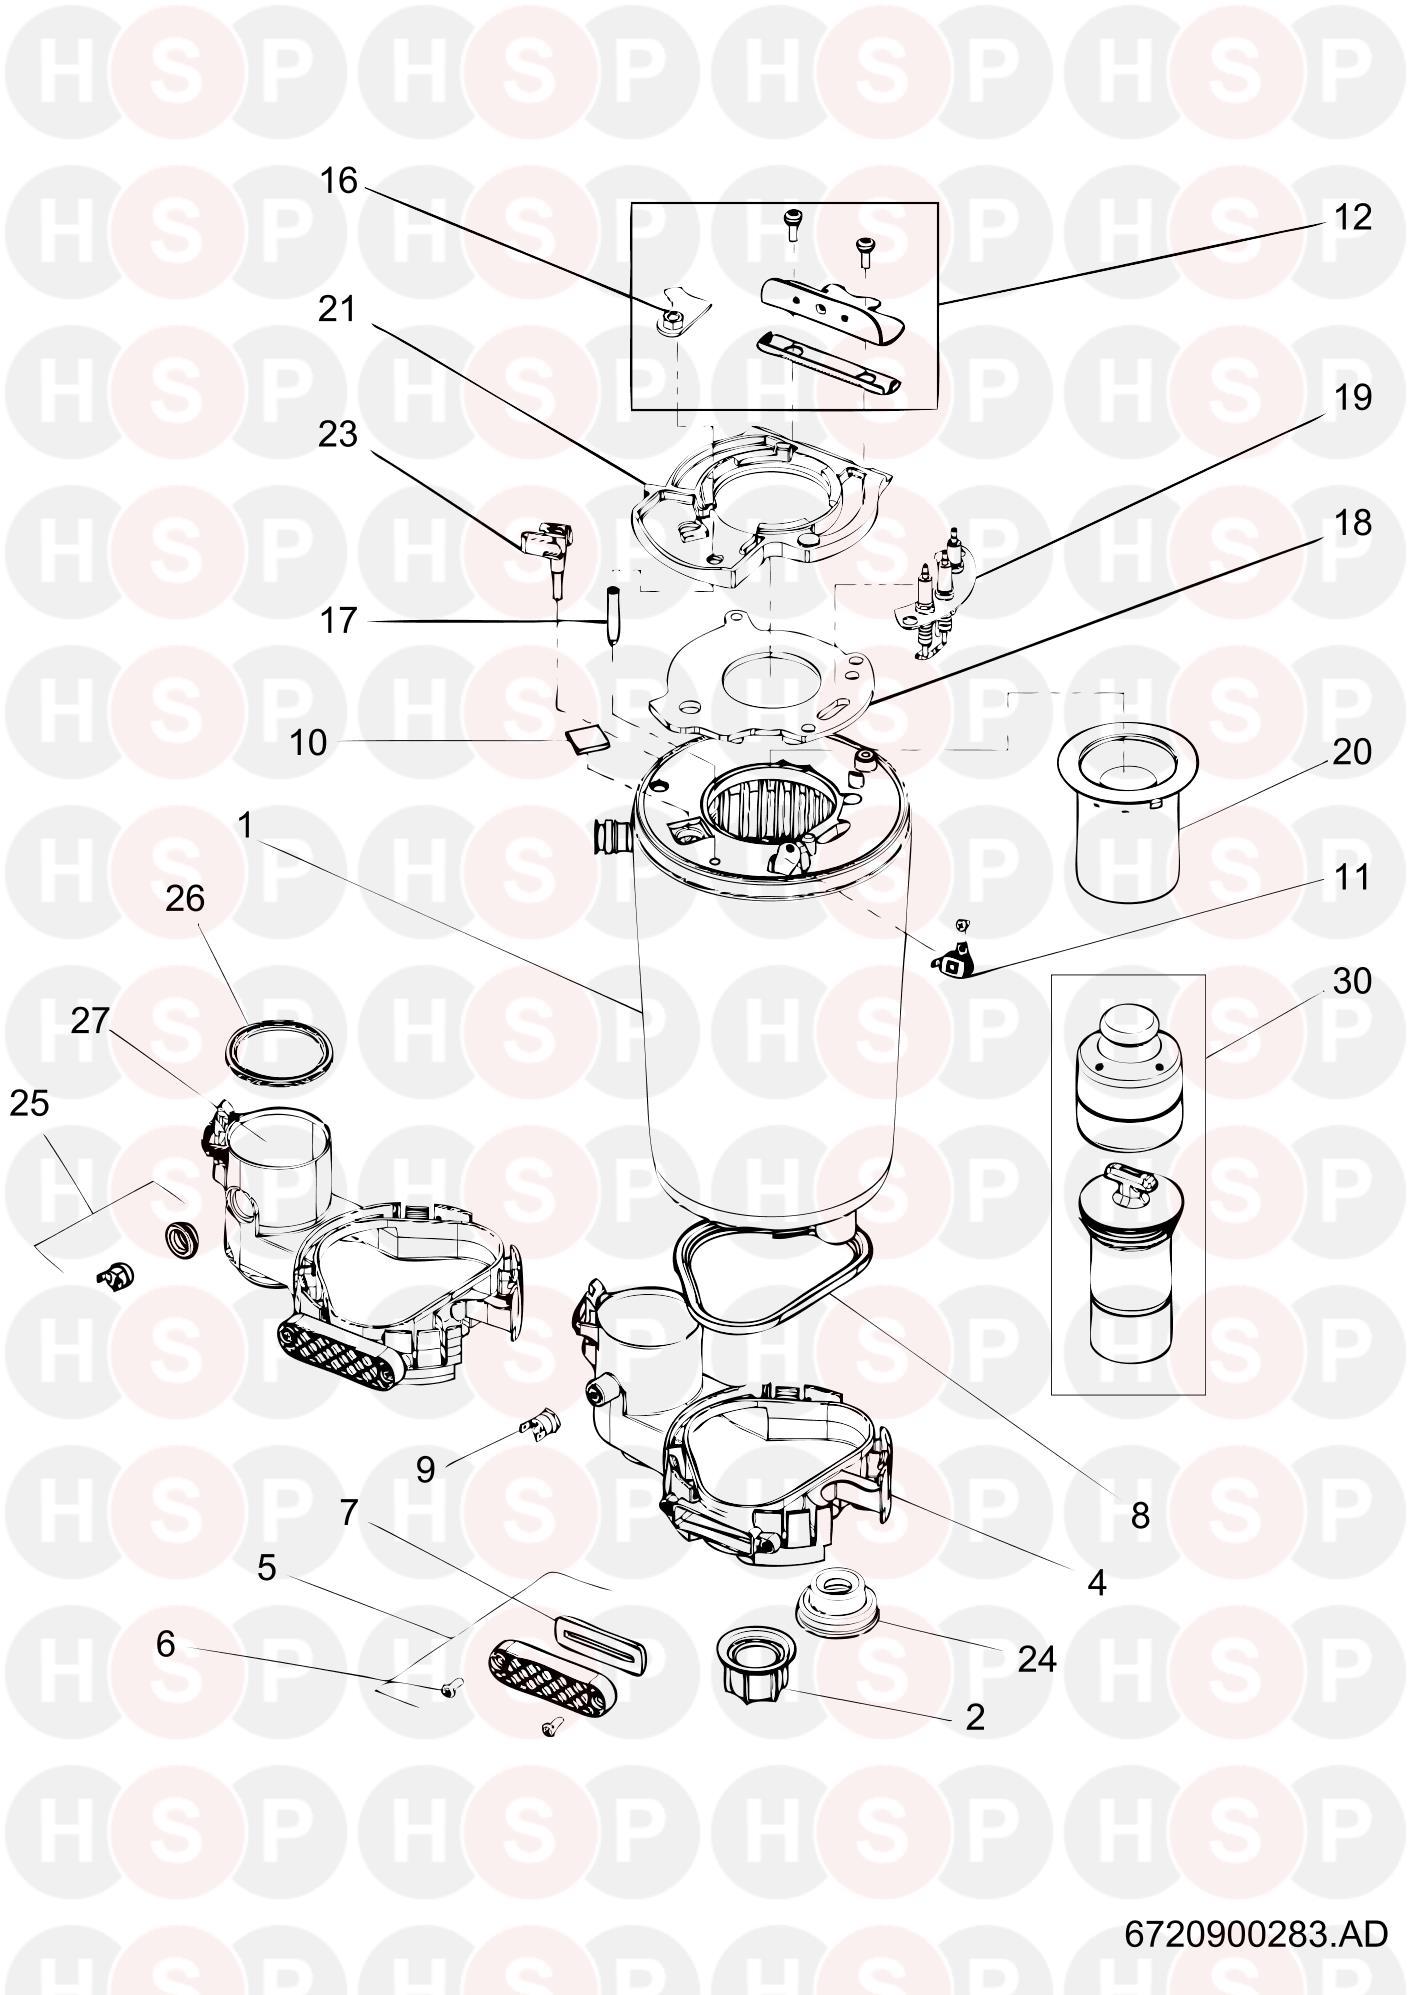 Worcester Greenstar 30 Si (HEAT EXCHANGER) Diagram